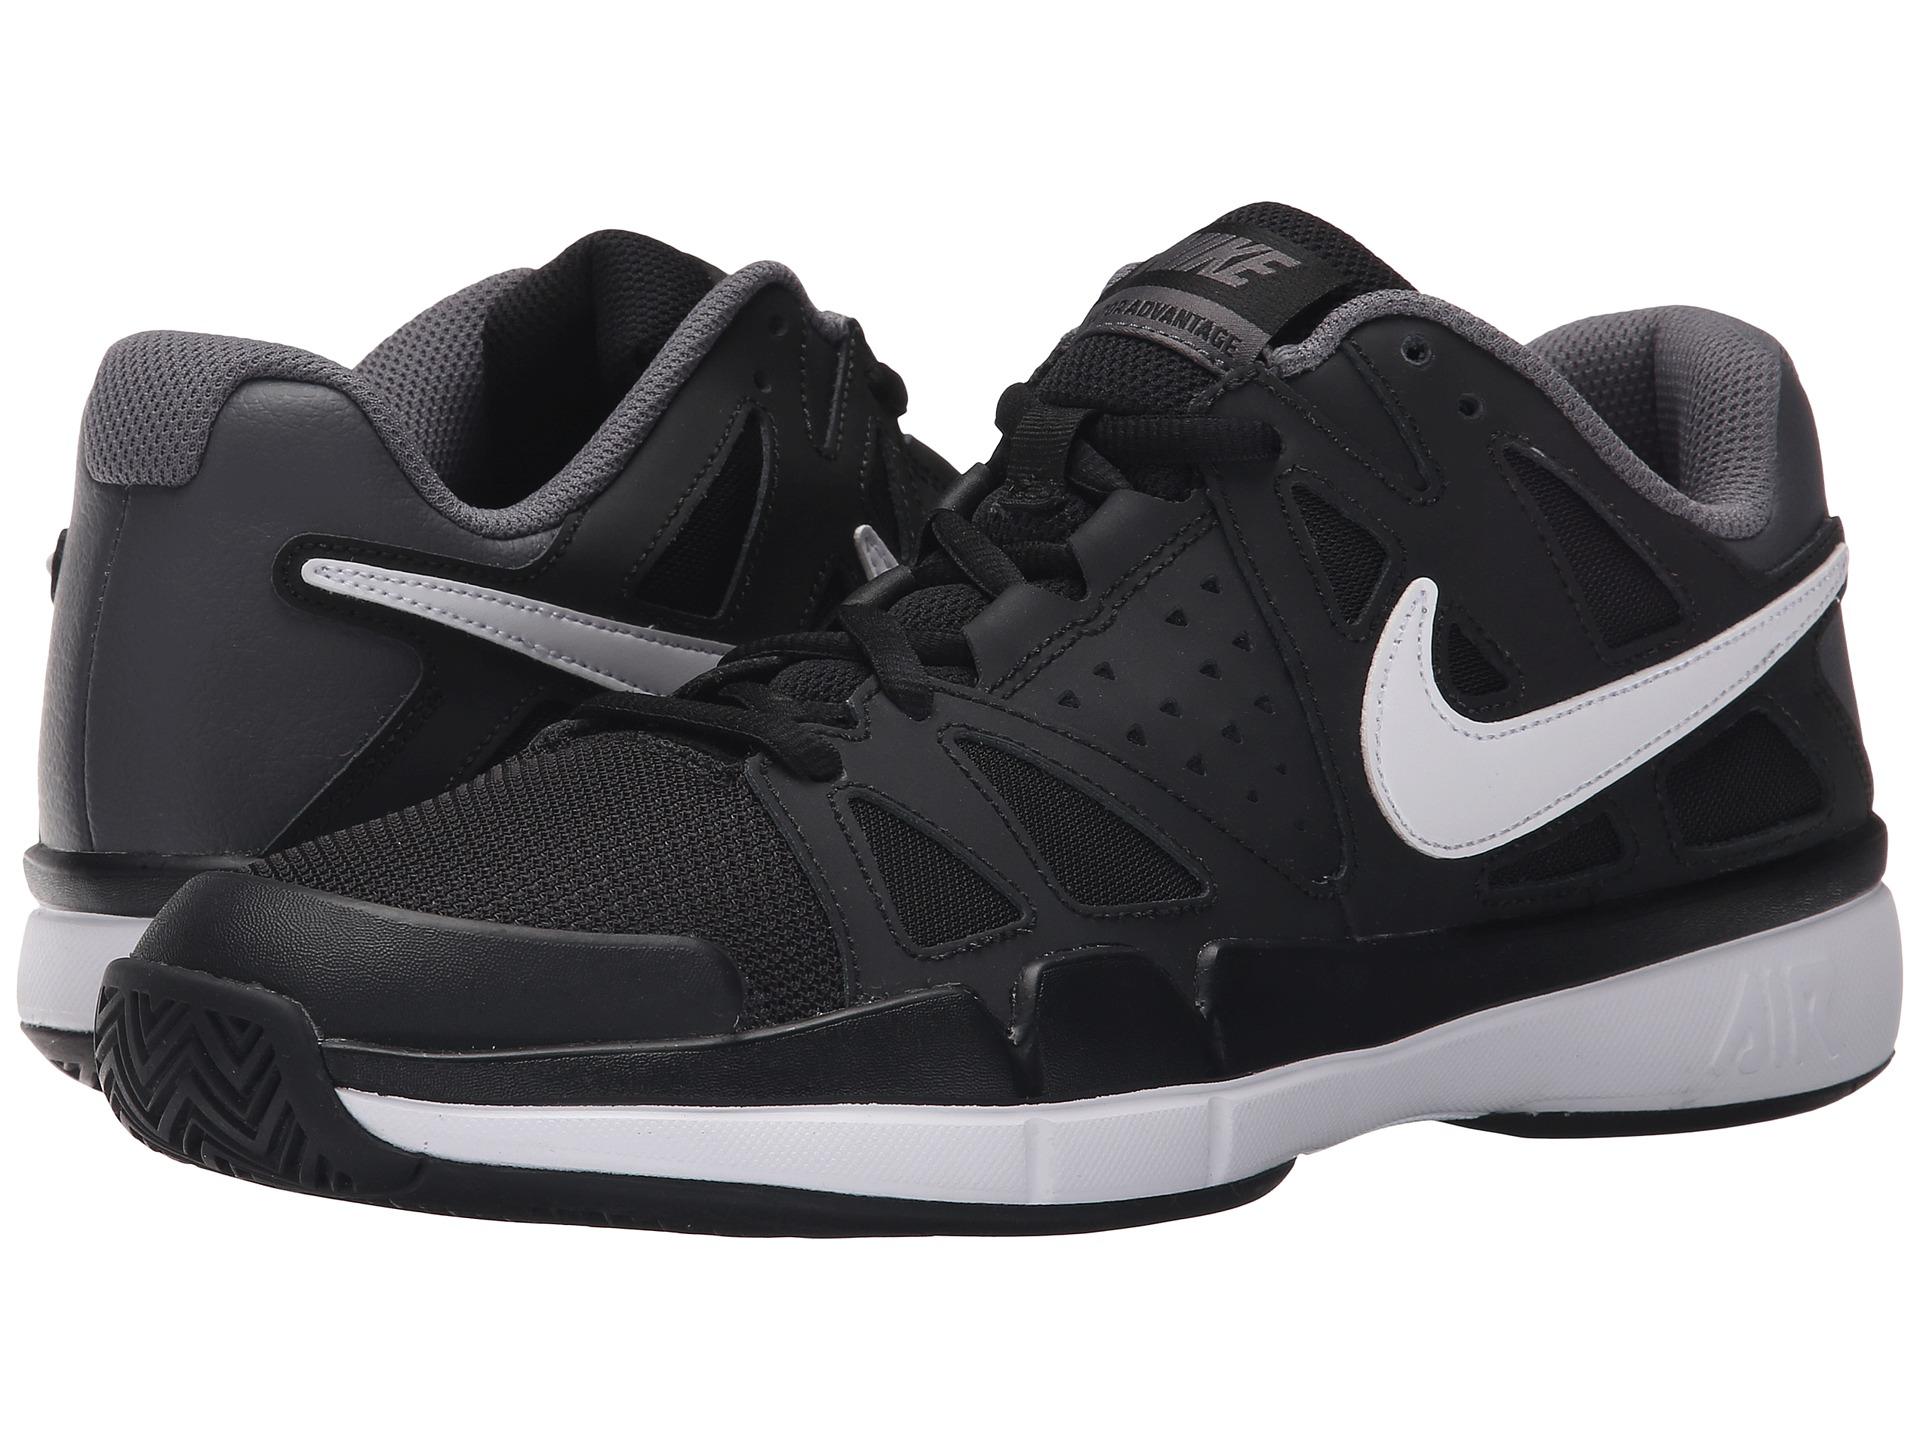 check out 04db8 cb403 nike vapor shoes